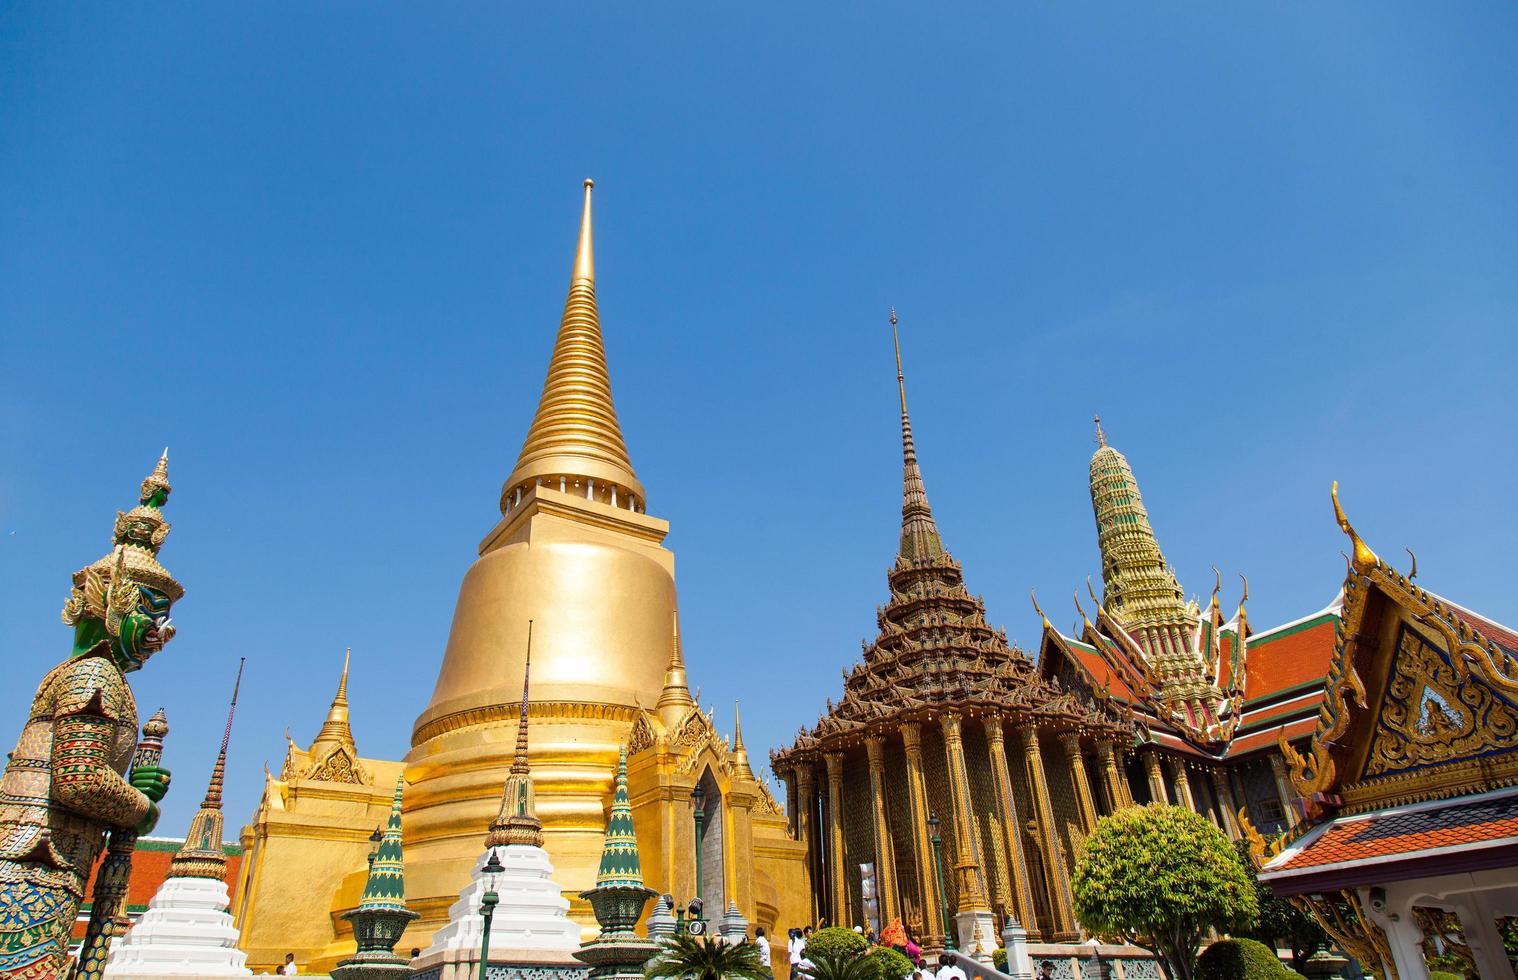 tempio di wat phra kaew in thailandia foto